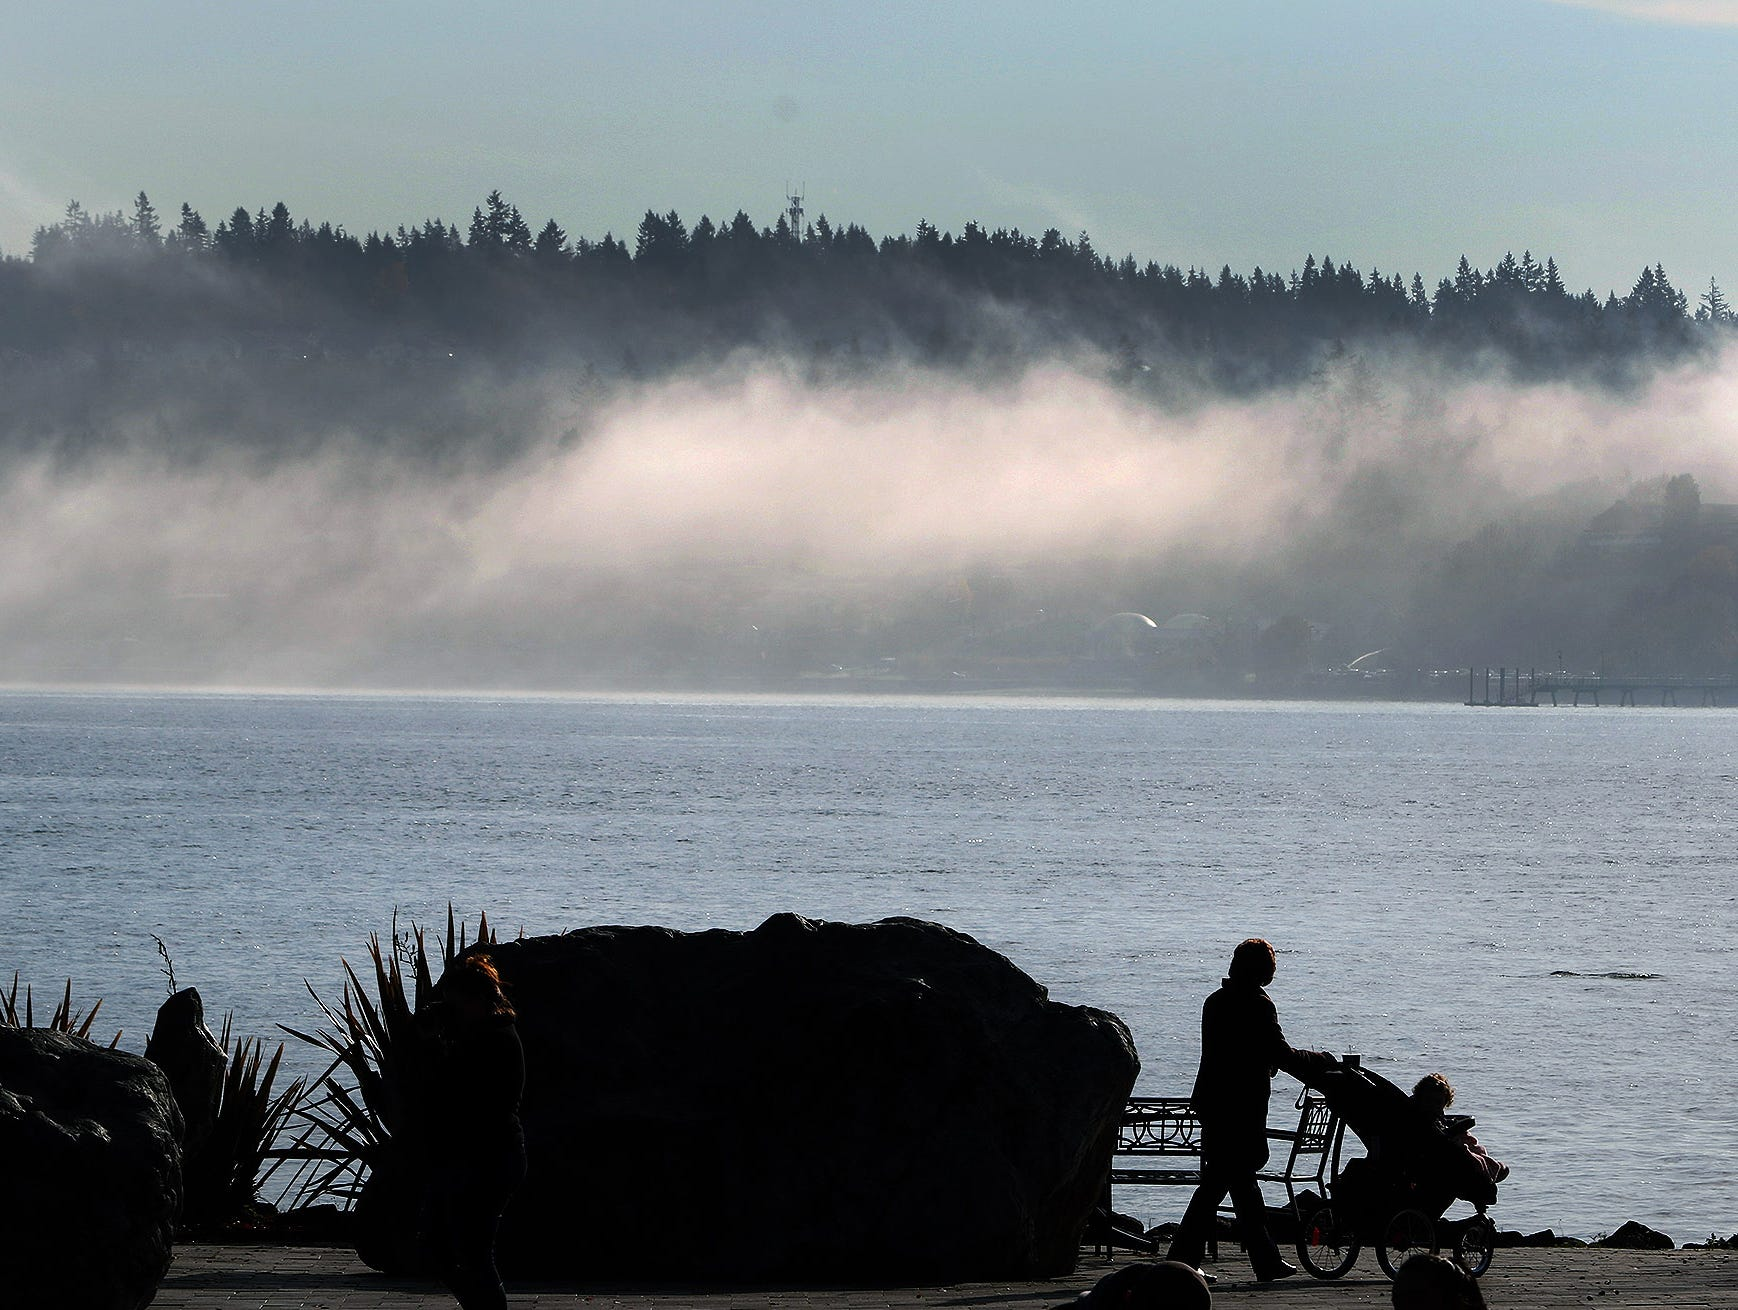 The morning fog burns off on Tuesday, November 20, 2018, from the Harborside Fountain Park in Bremerton.